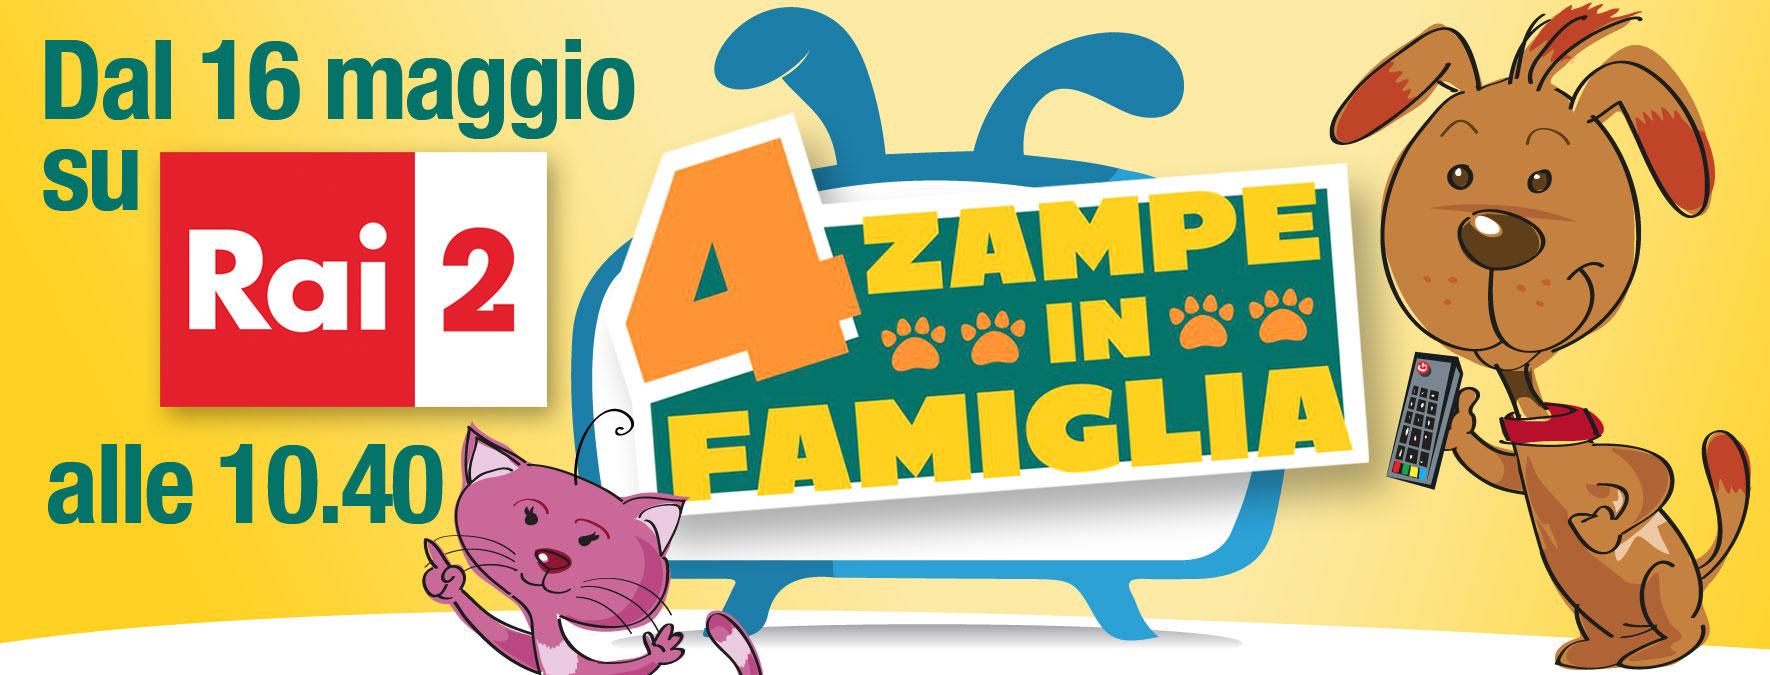 4-zampe-famiglia-NEWS